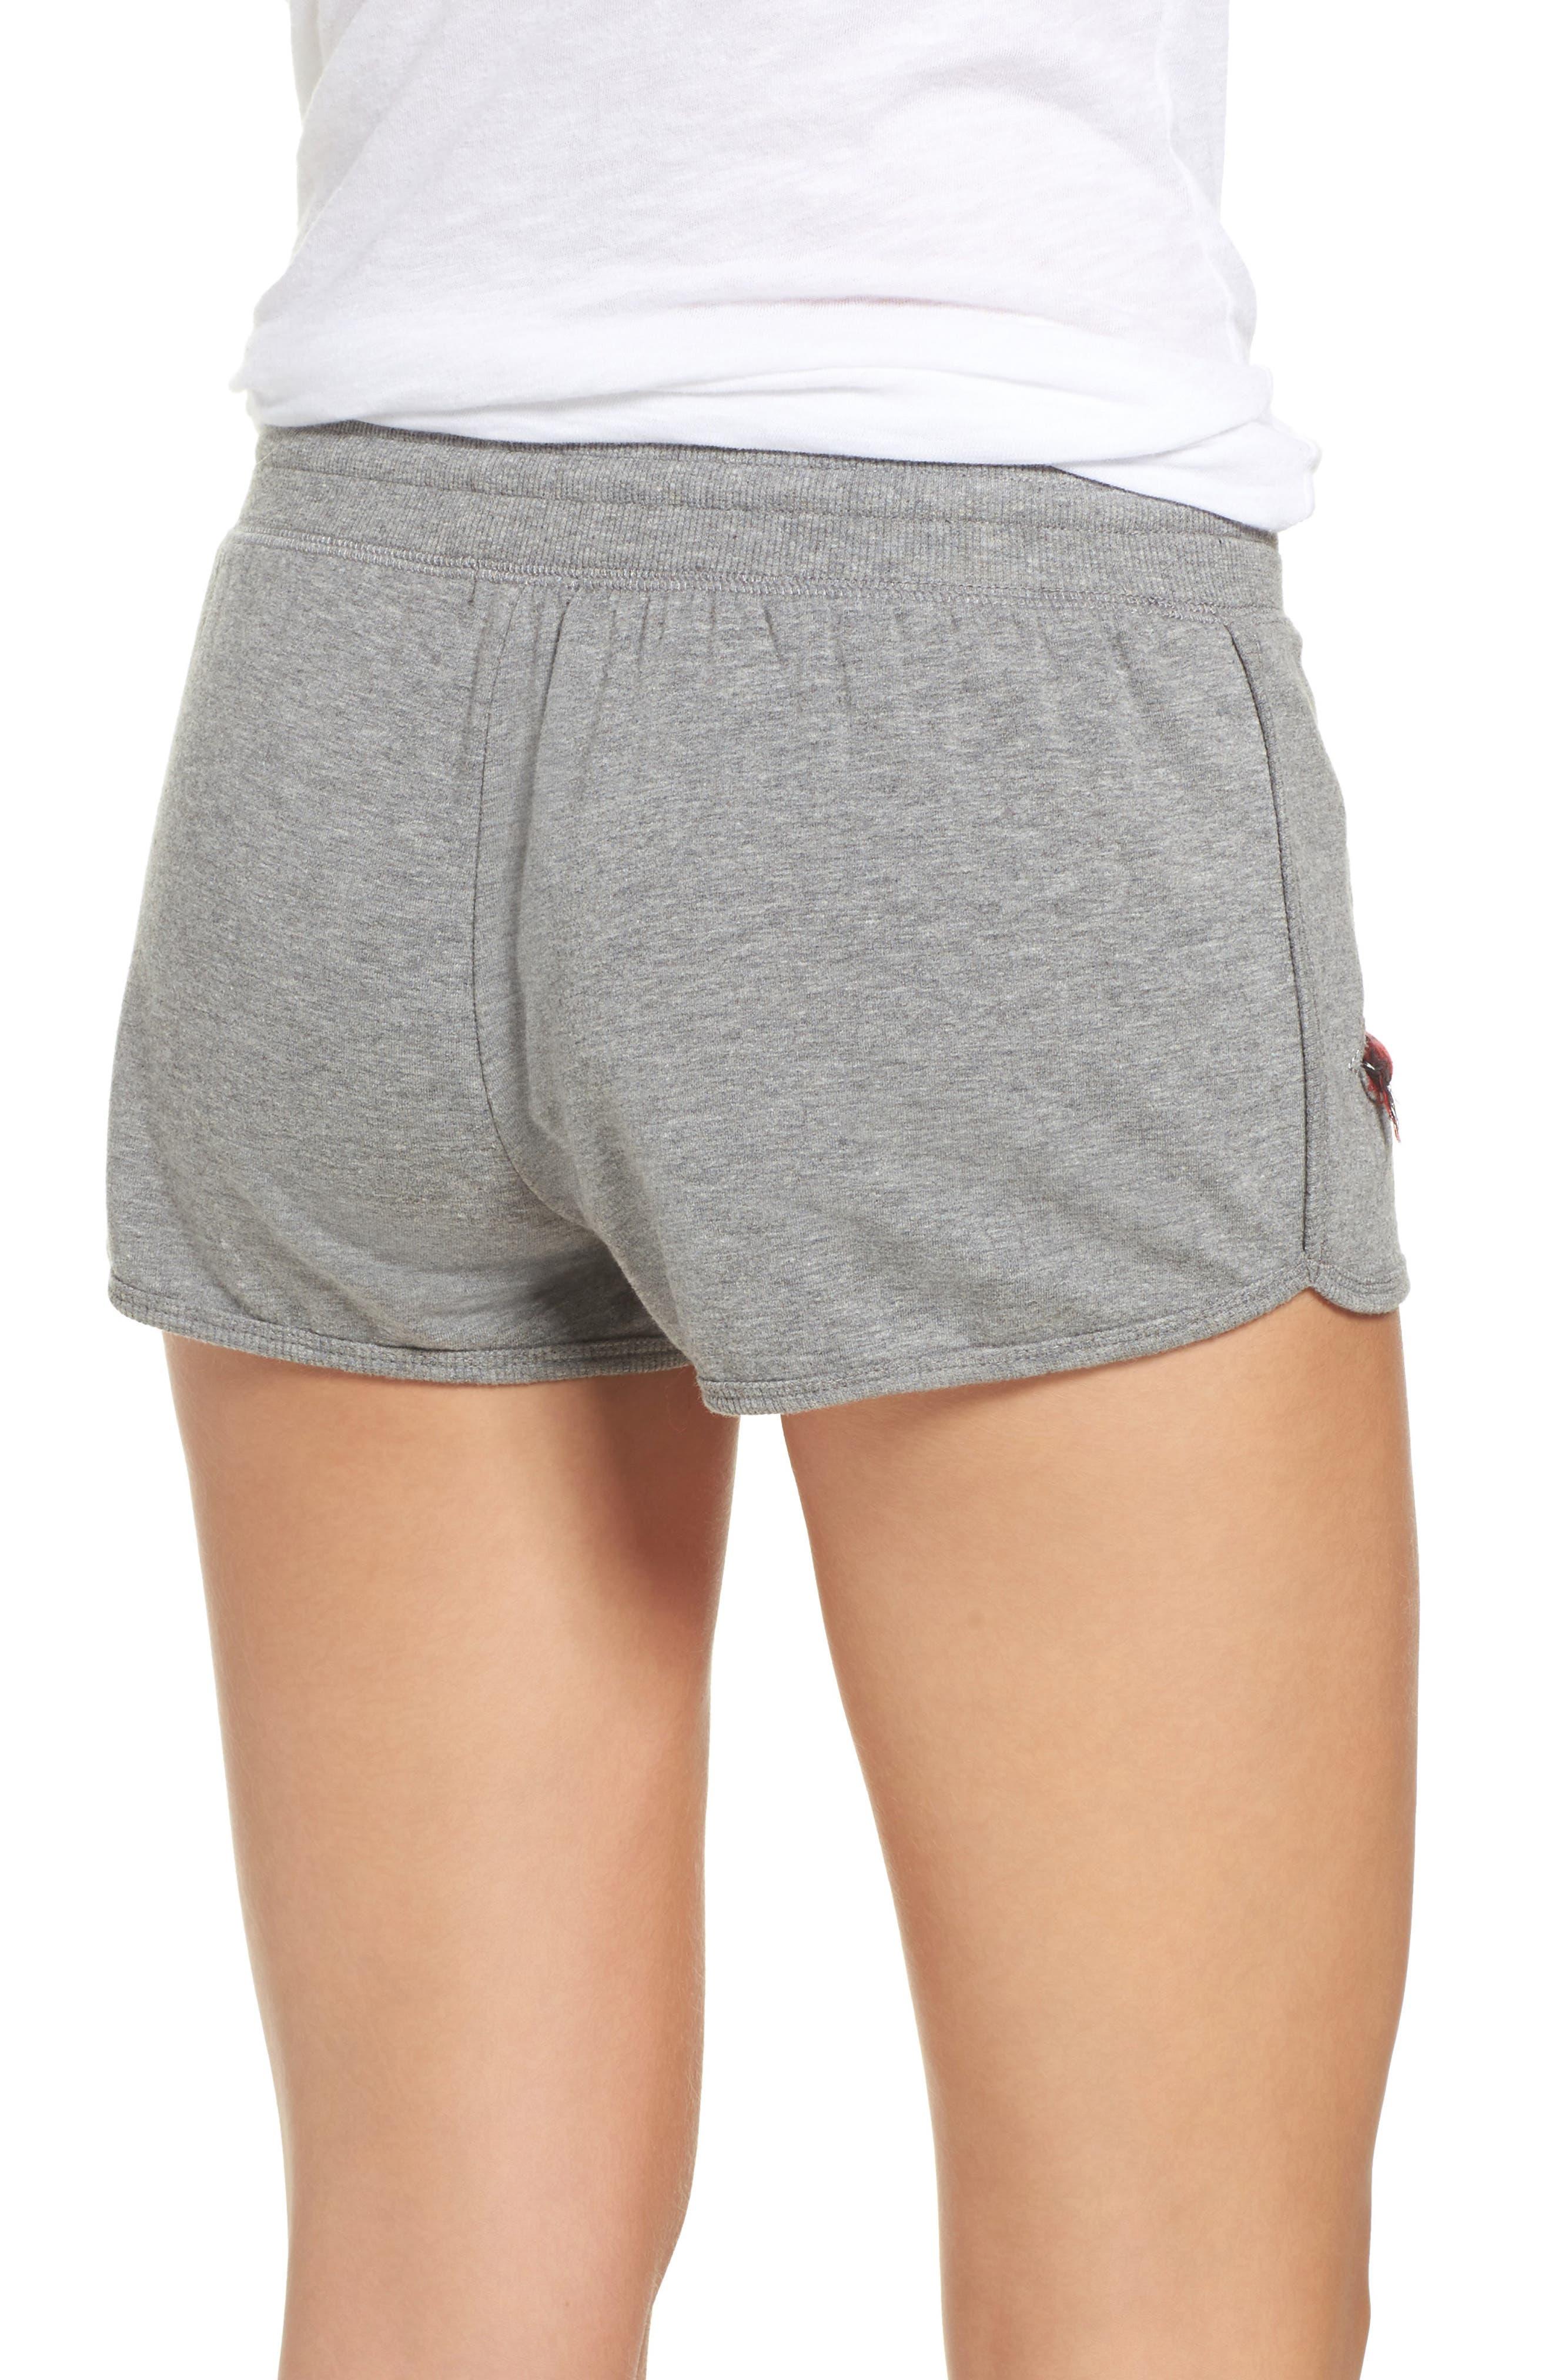 Lounge Shorts,                             Alternate thumbnail 2, color,                             H Grey